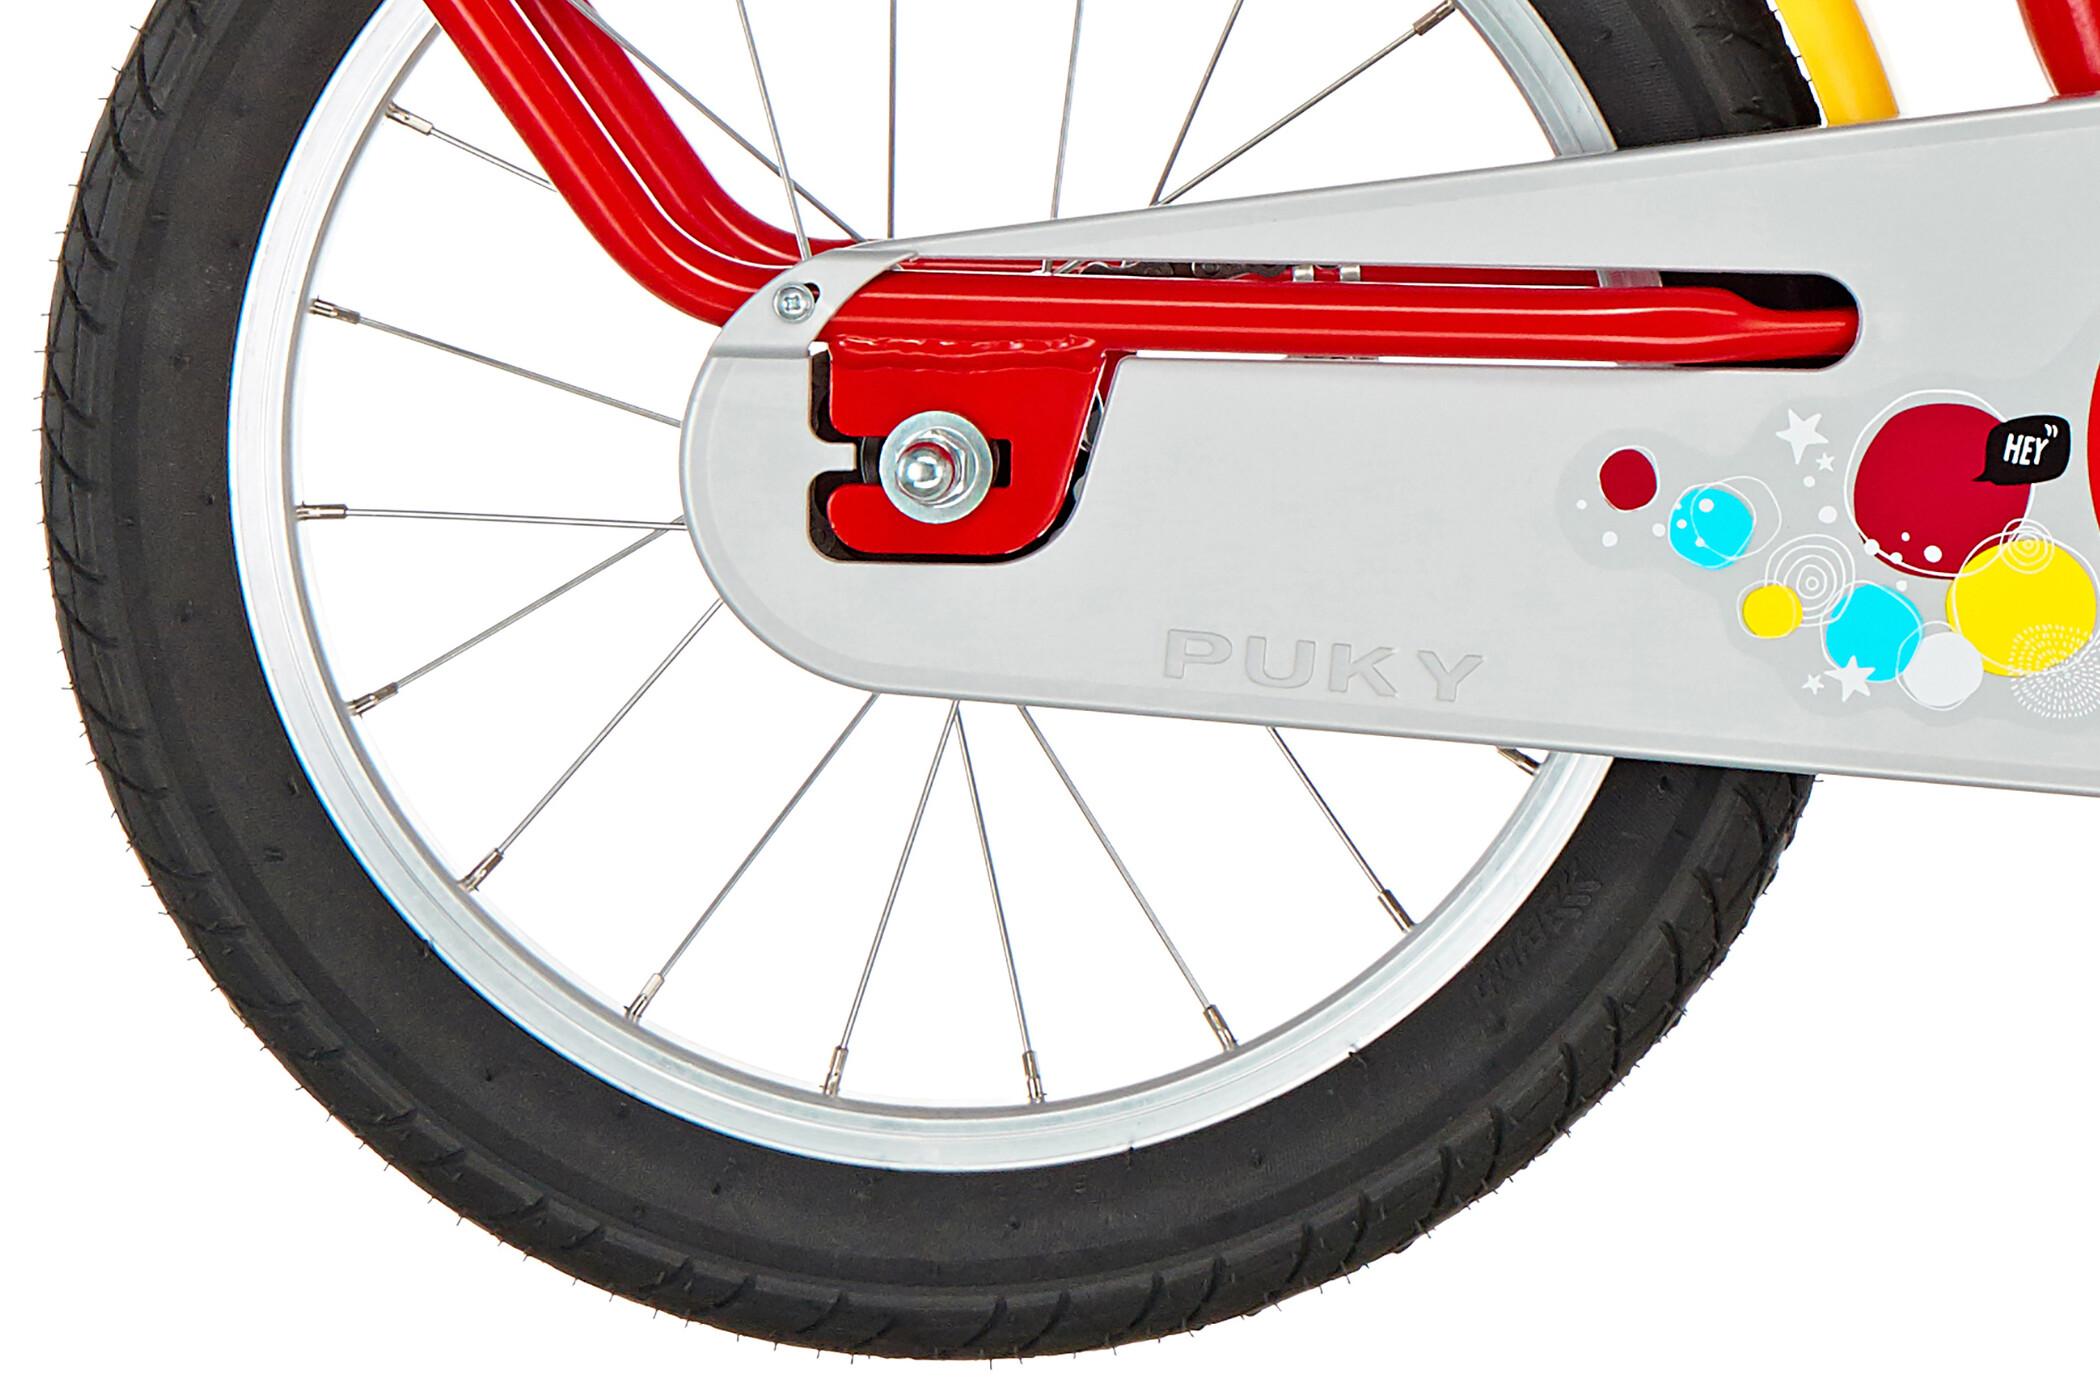 Puky Z 6 Fahrrad 16 Kinder online kaufen   bikester.at